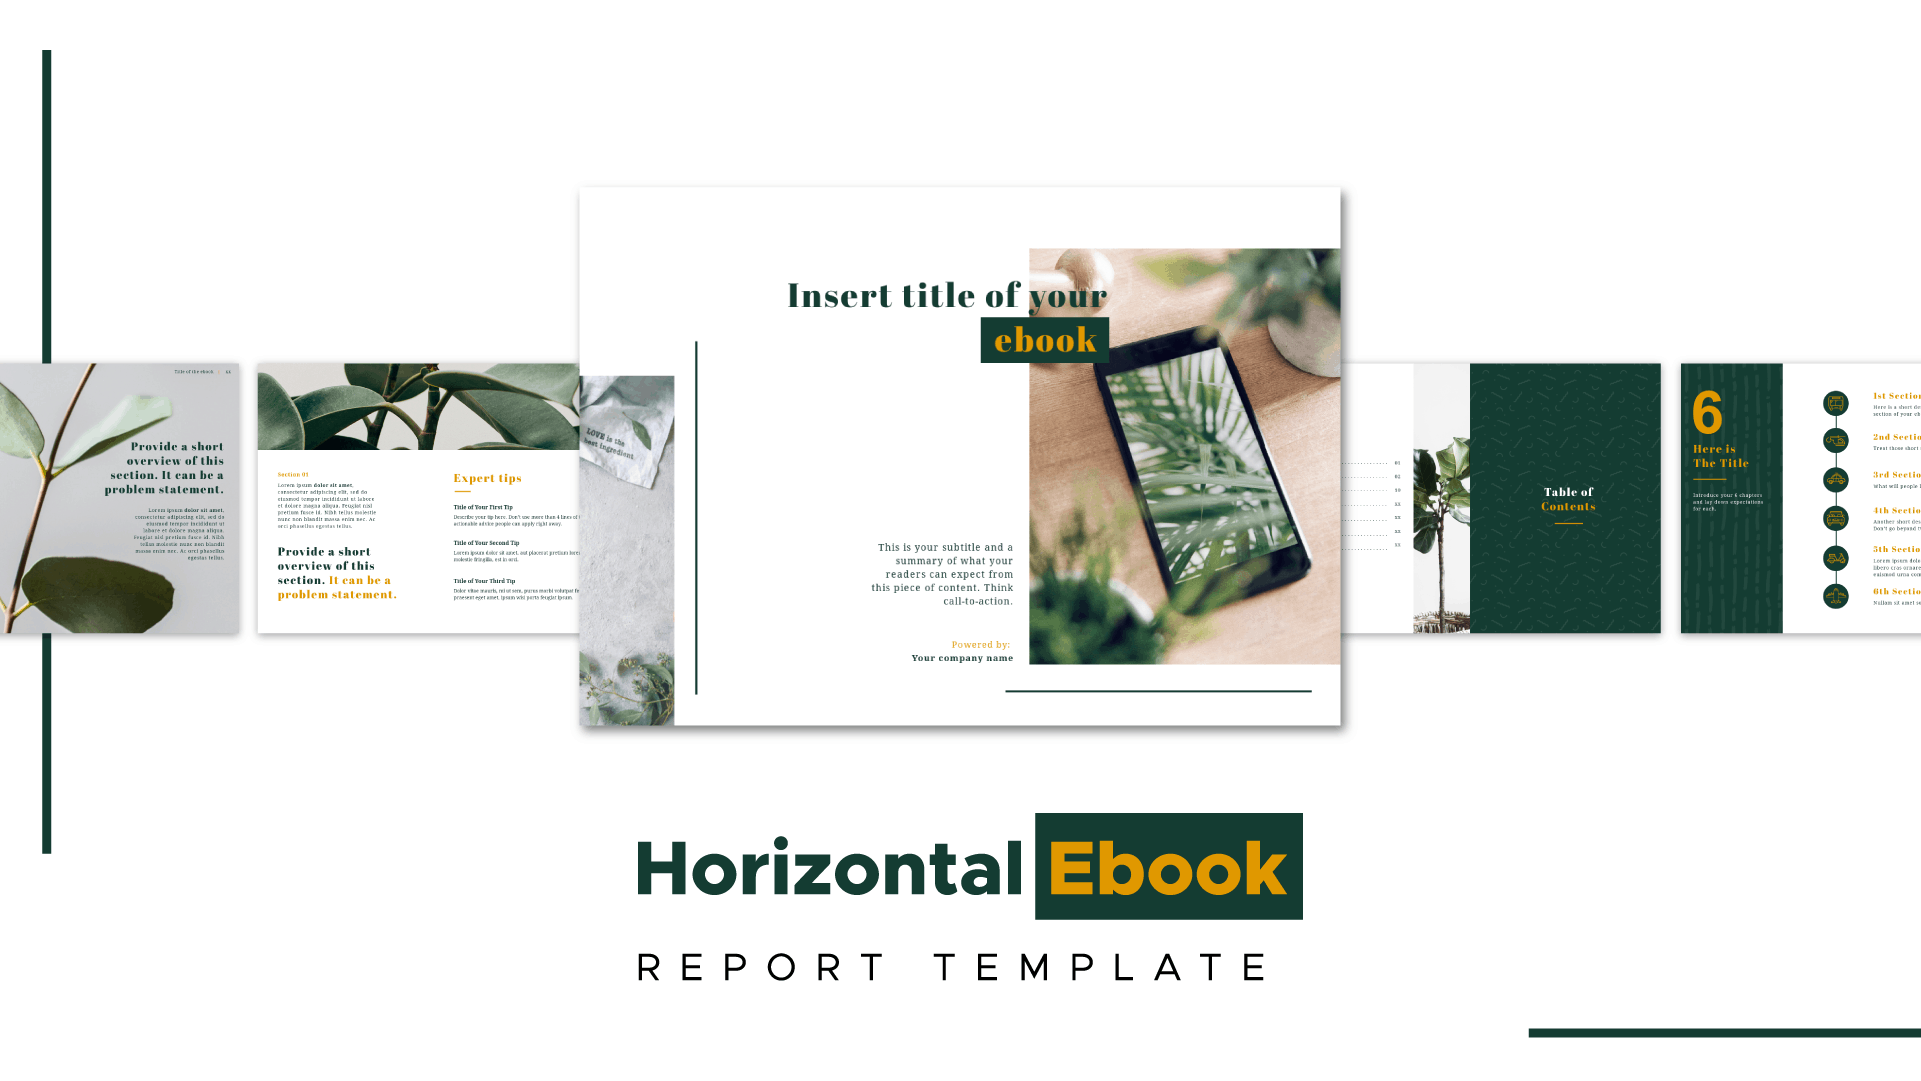 templates-visual_report_1208-1-6325597